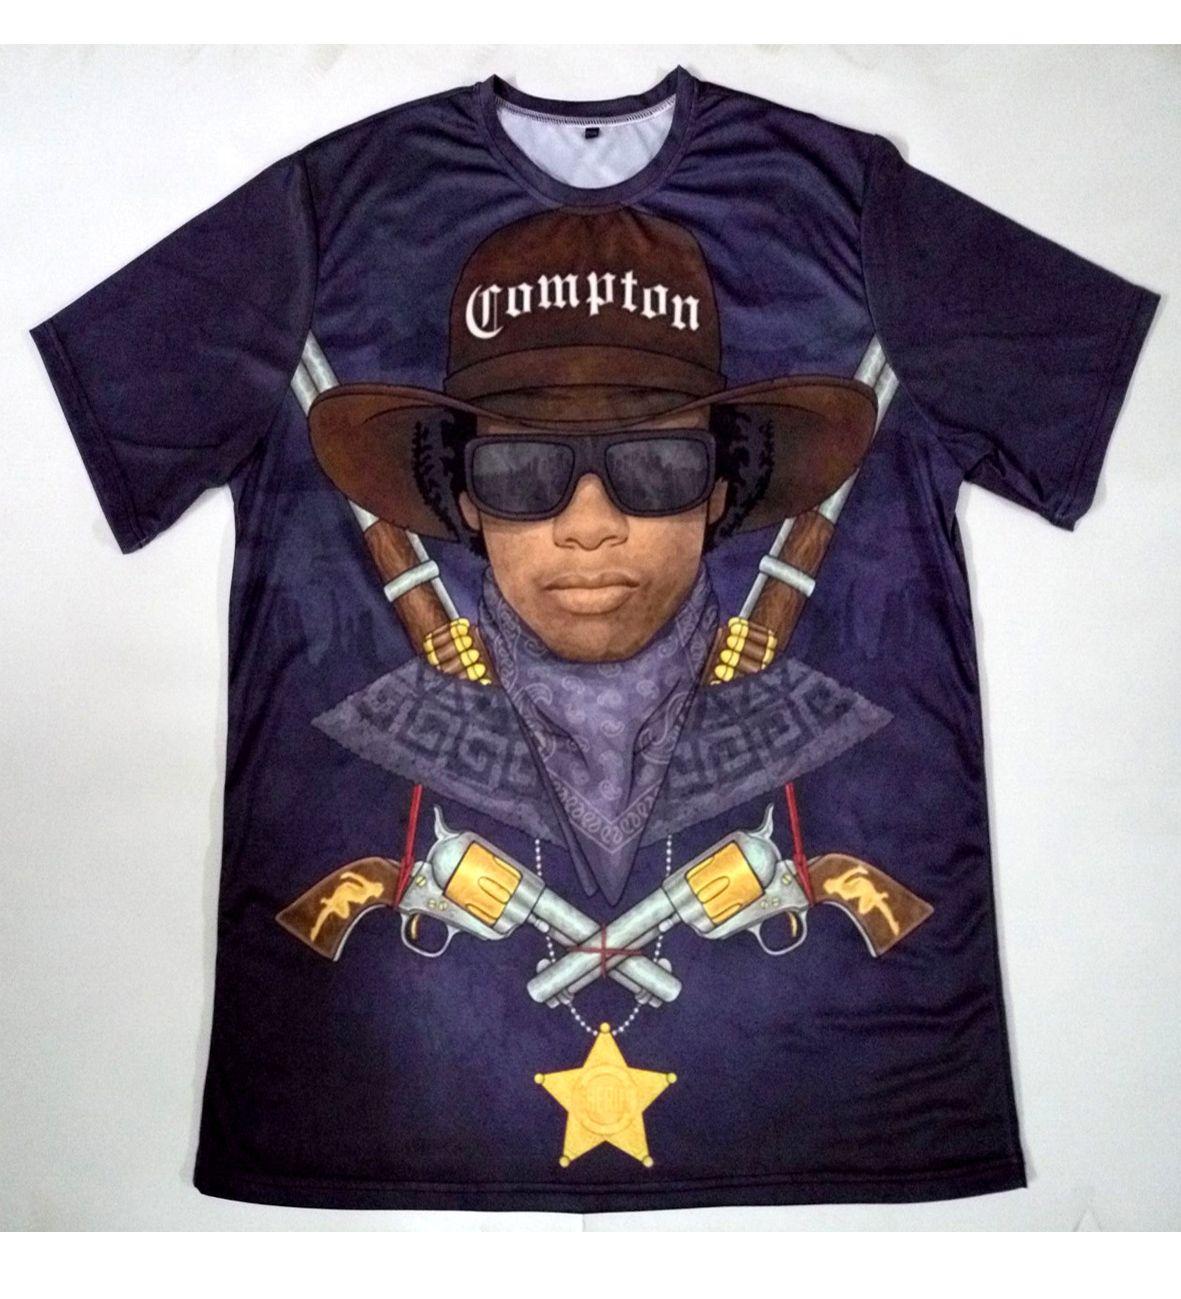 a2e2d6ae3 Real USA Size Custom Made Native Eazy E Fashion 3D Sublimation Print T Shirt  Custom T Shirts T Shirt Printing From Onlyforfashion, $15.54| DHgate.Com